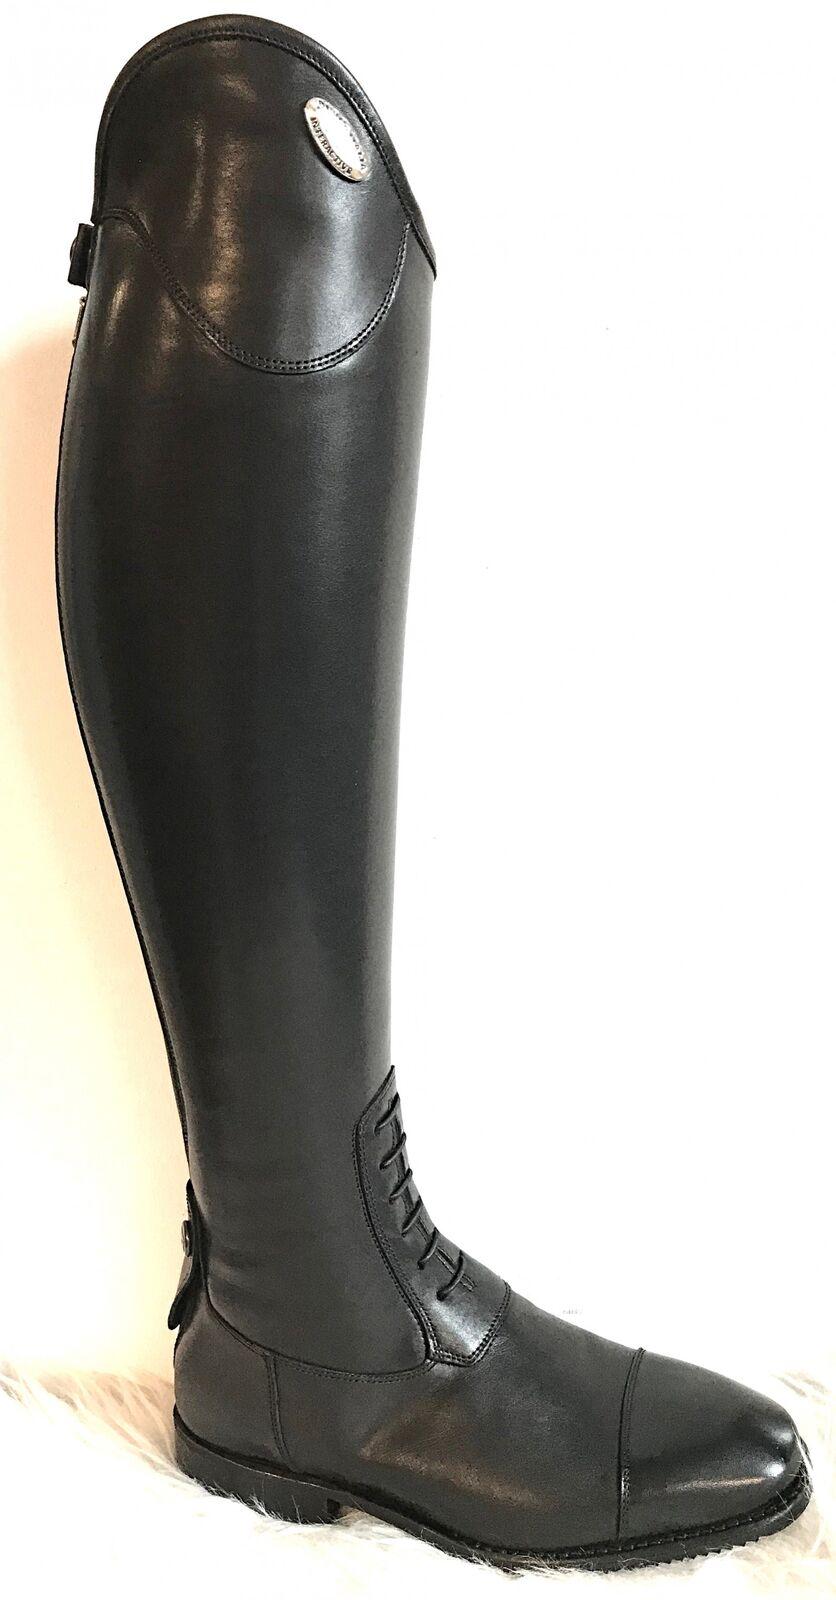 DeNiro riding botas Salento 02 negro 37 MA L